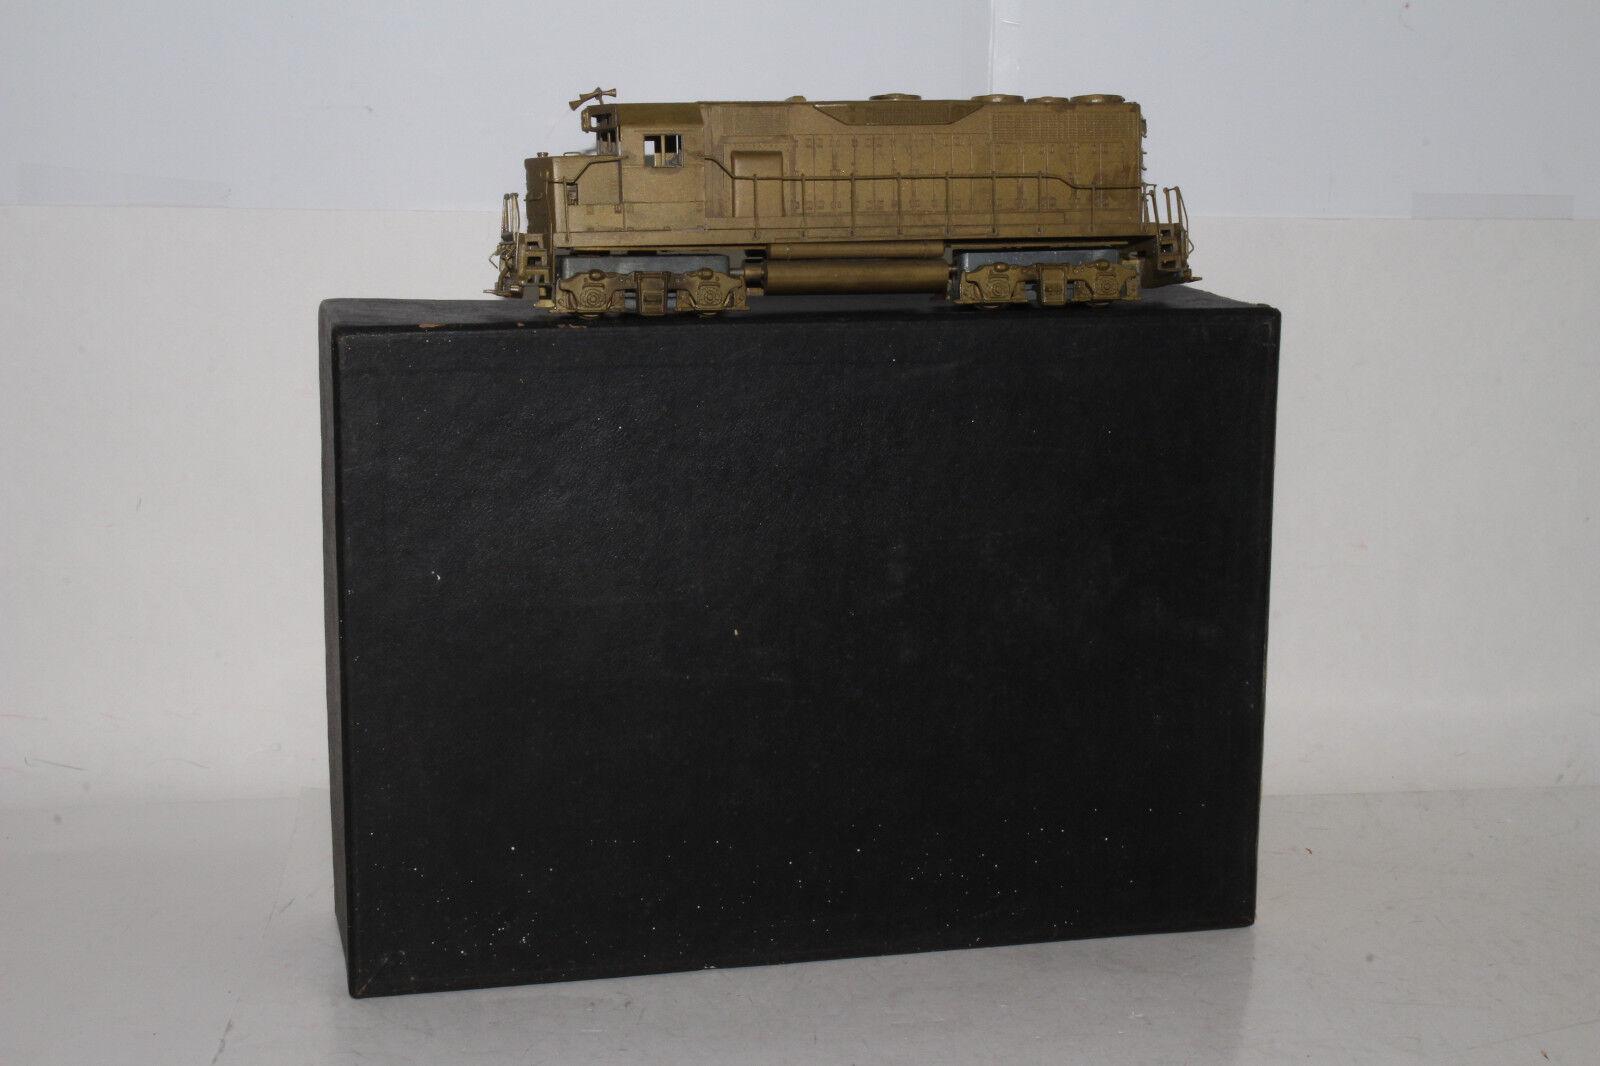 HALLMARK MODELS BRASS HO SCALE E.M.D. GP-35 DIESEL LOCOMOTIVE ENGINE, BOXED